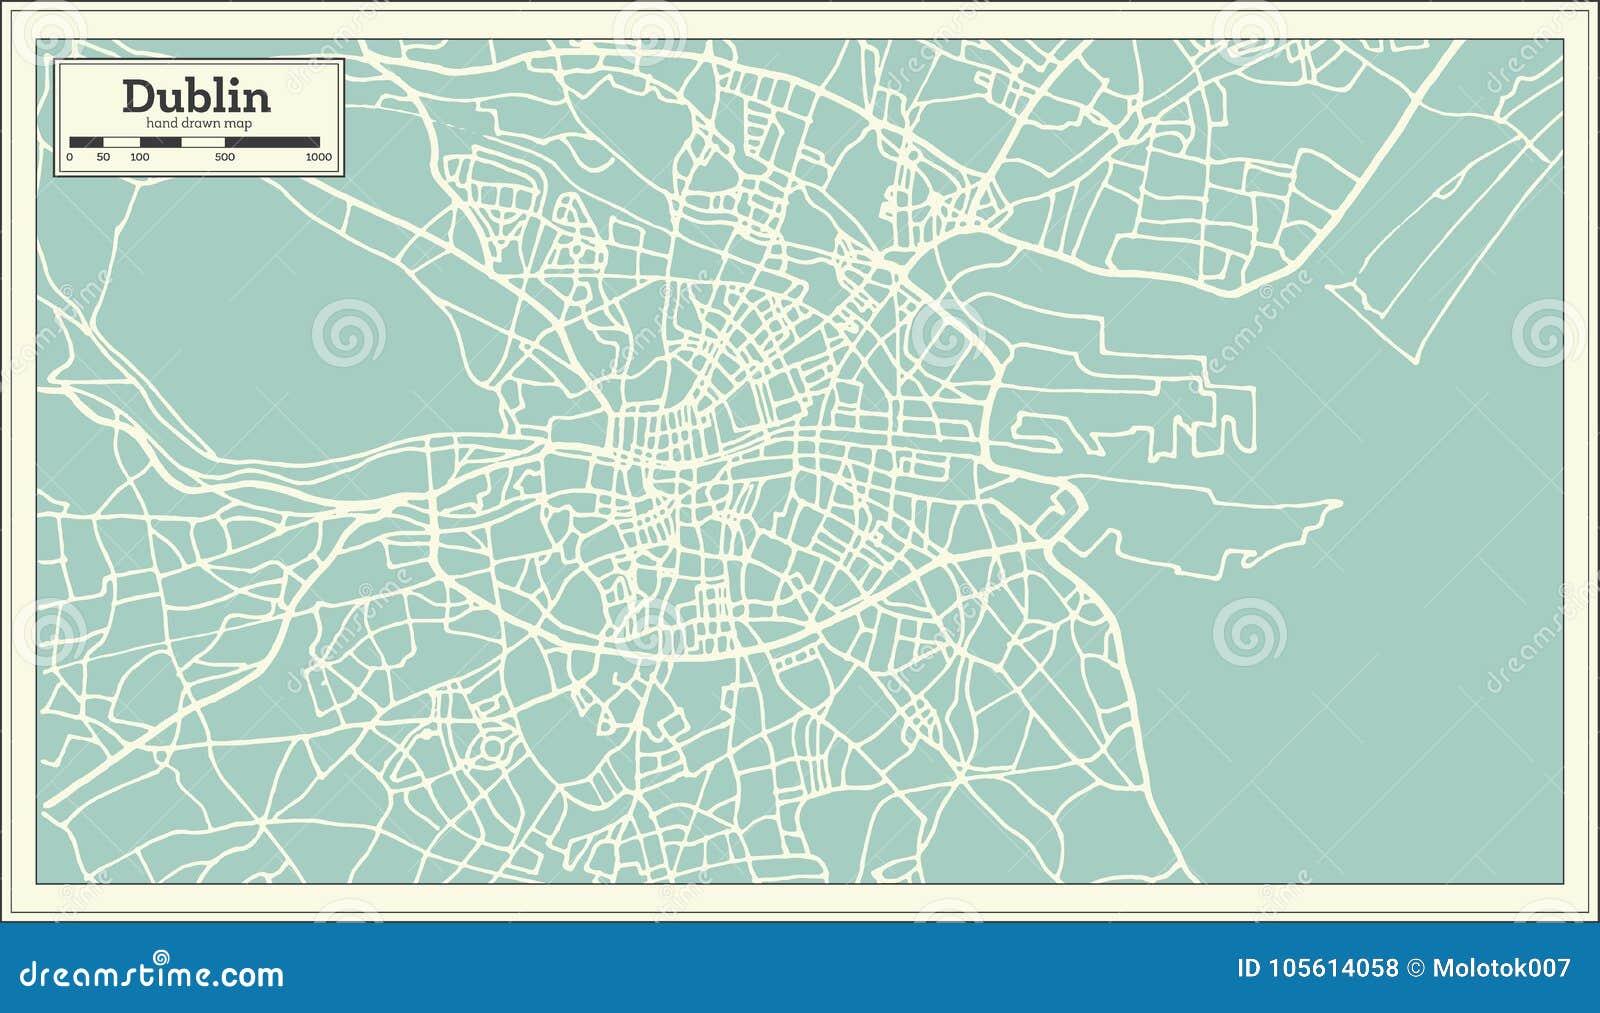 Street Map Of Ireland.Dublin Ireland Map In Retro Style Stock Vector Illustration Of